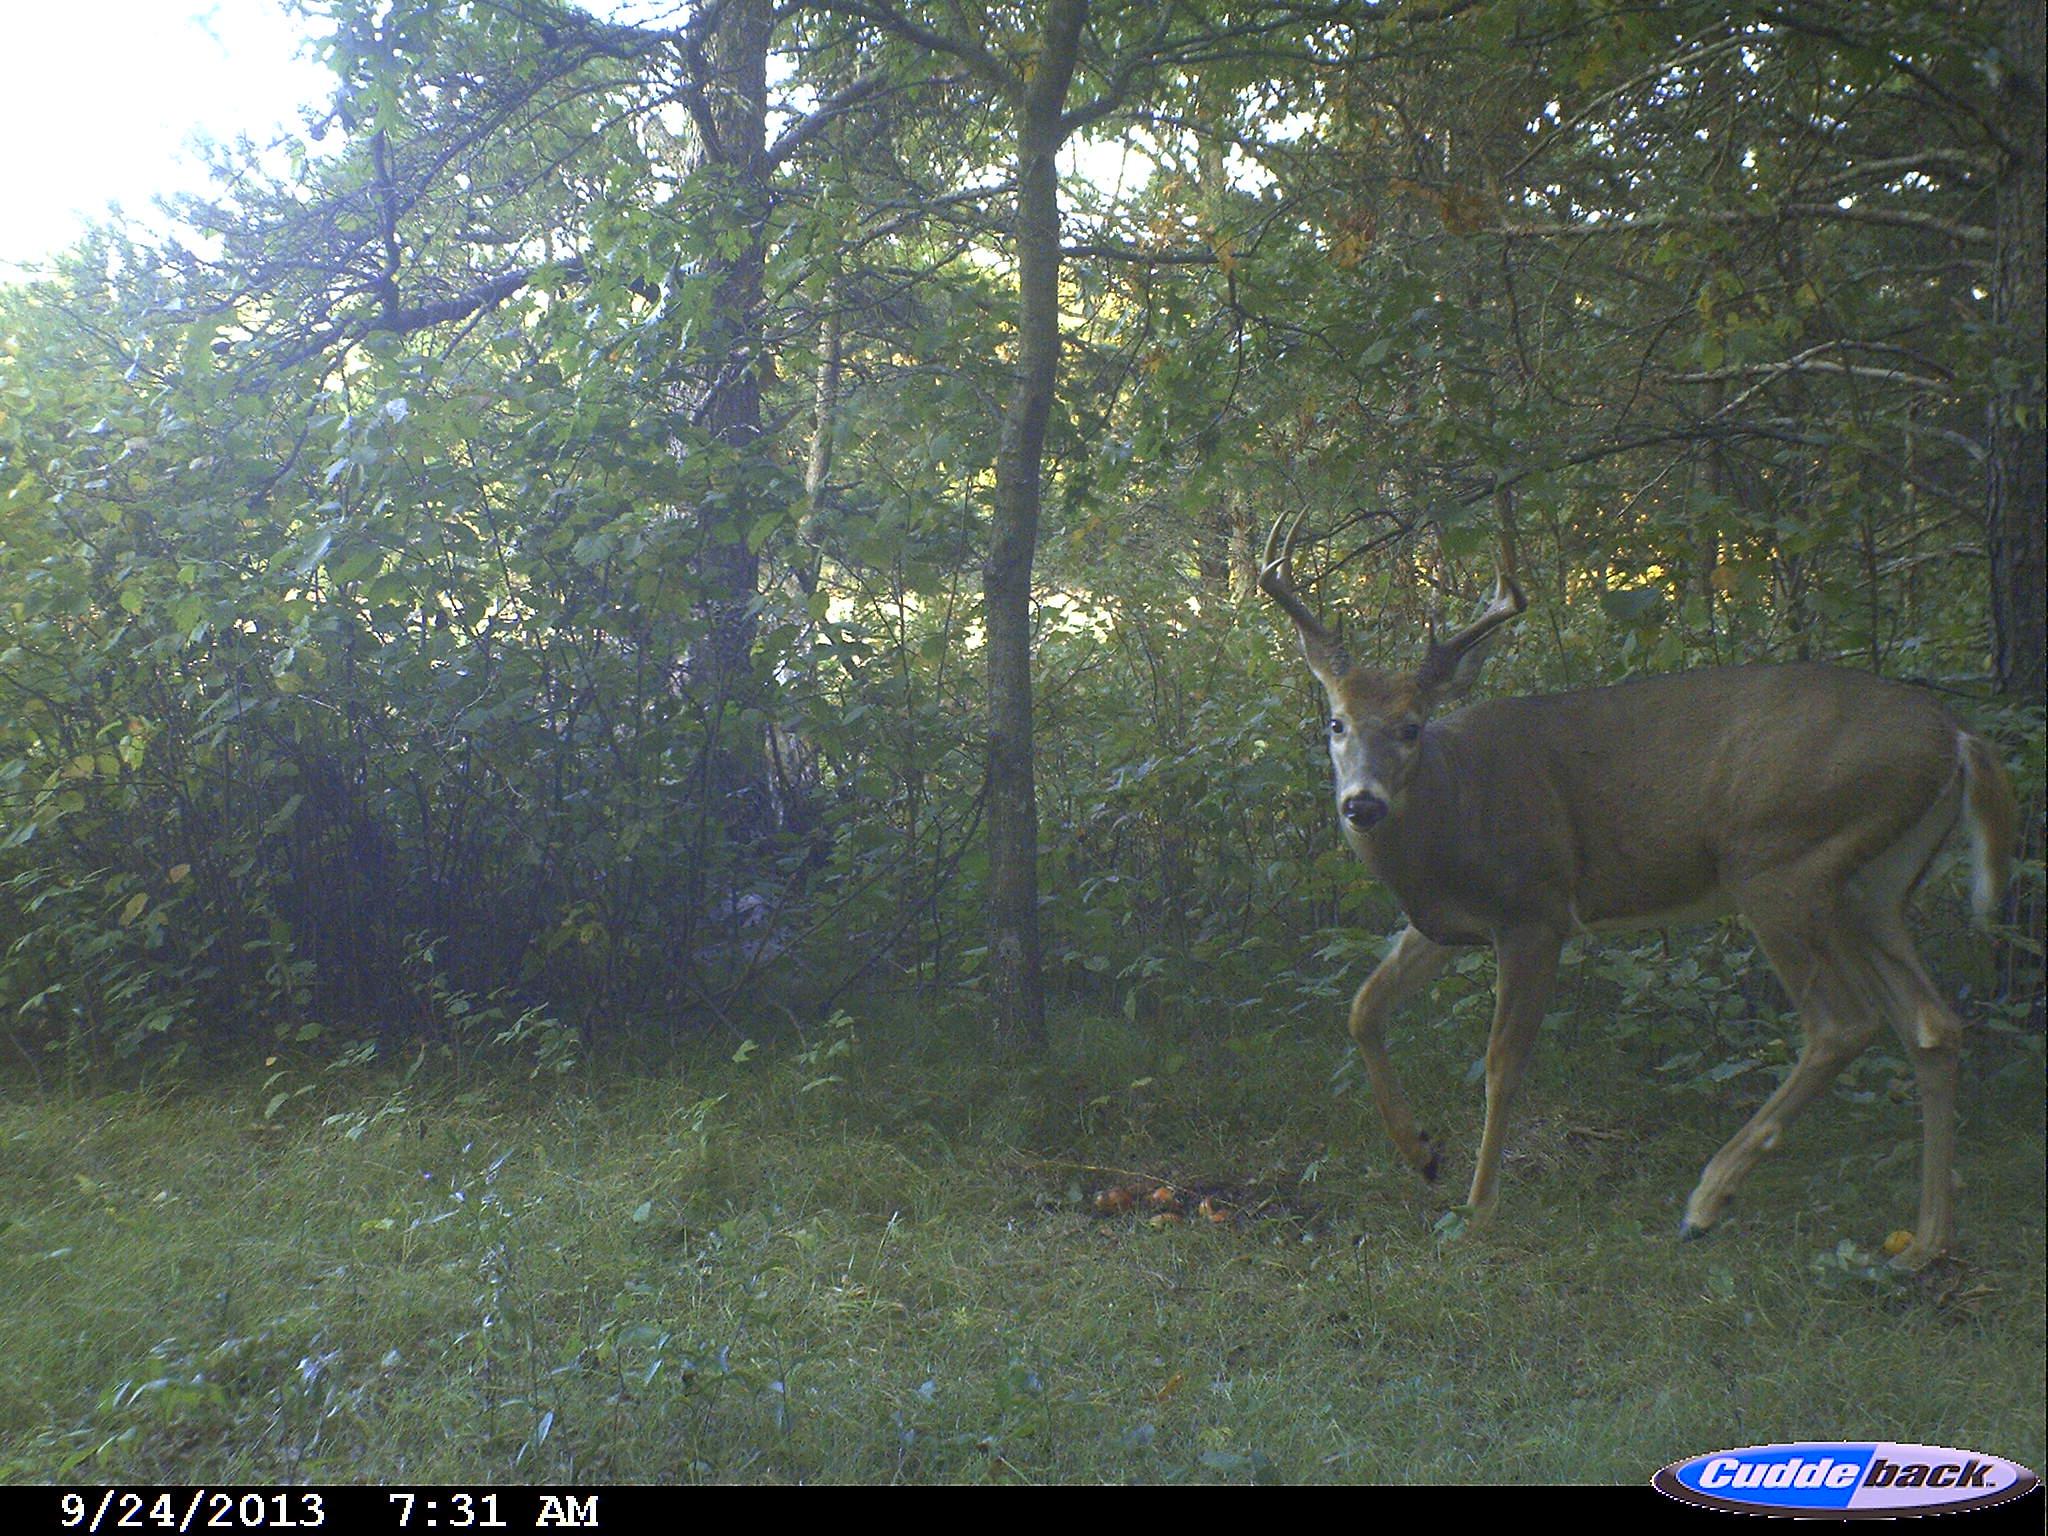 Deer Hunting Morning Or Evening Outdoorhub